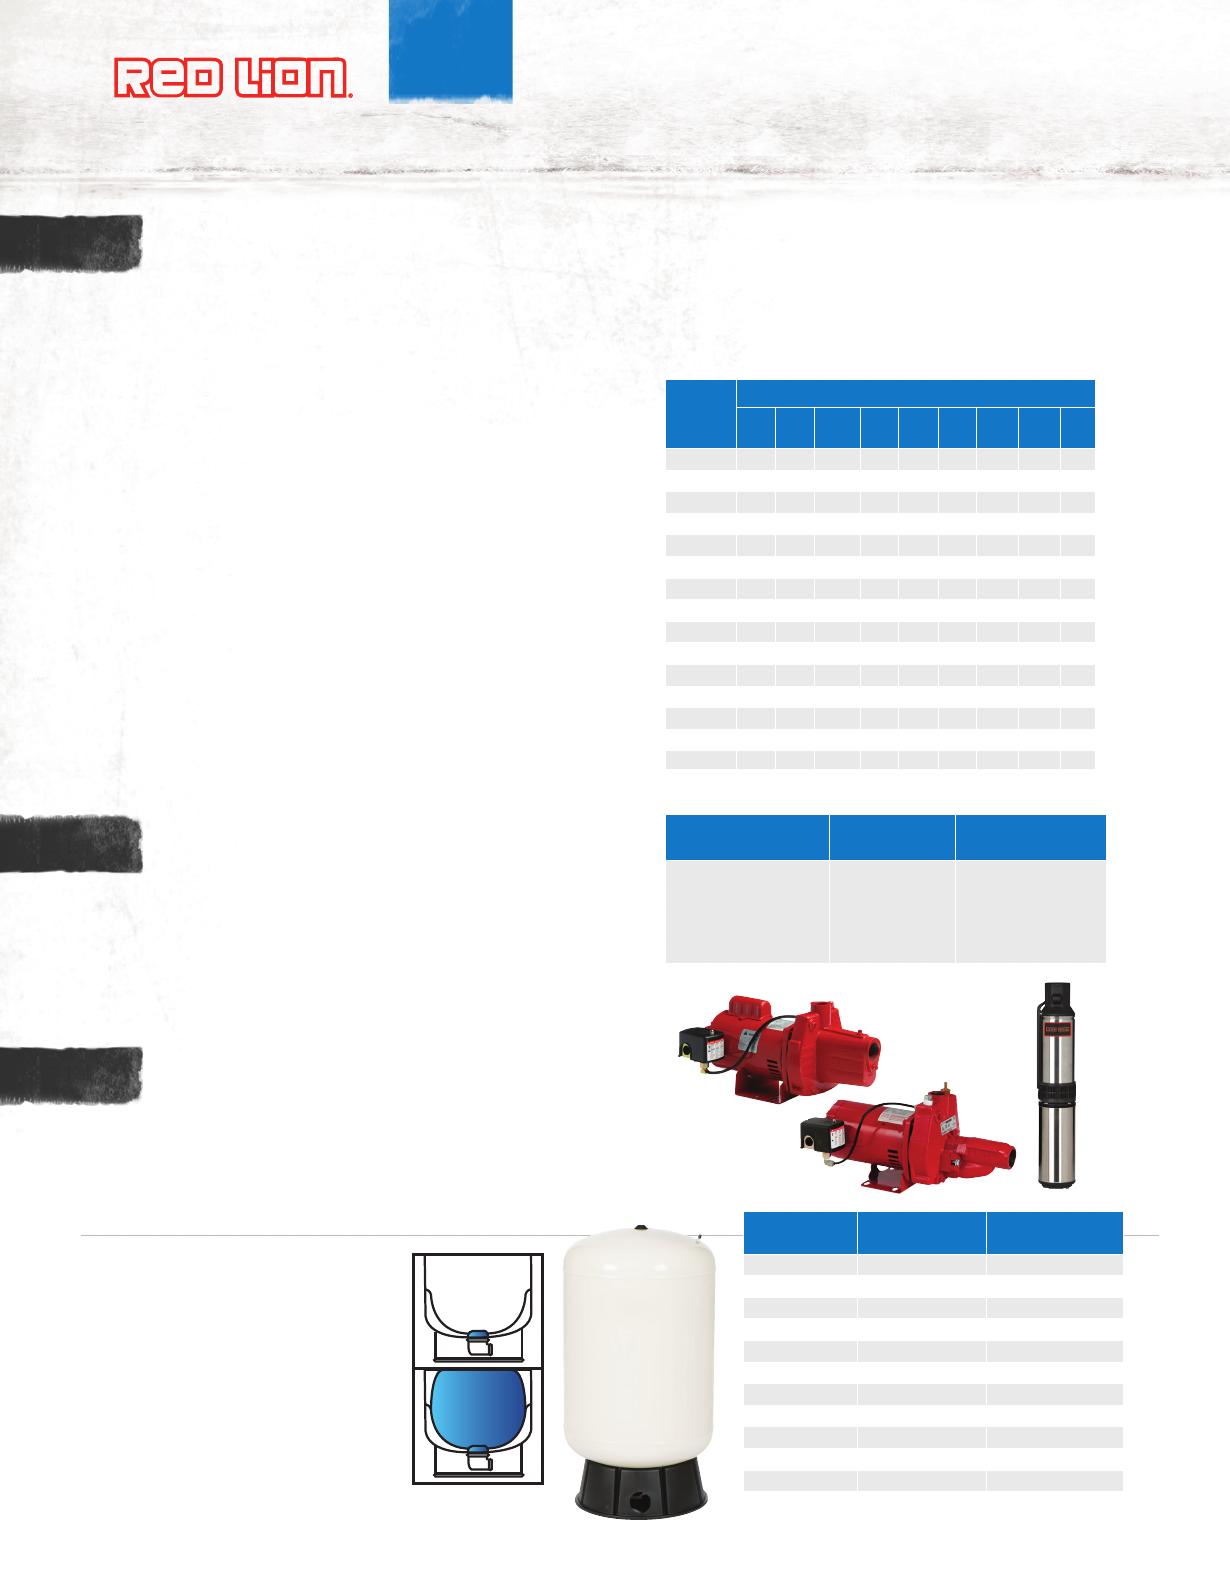 33 Shallow Well Pump Installation Diagram